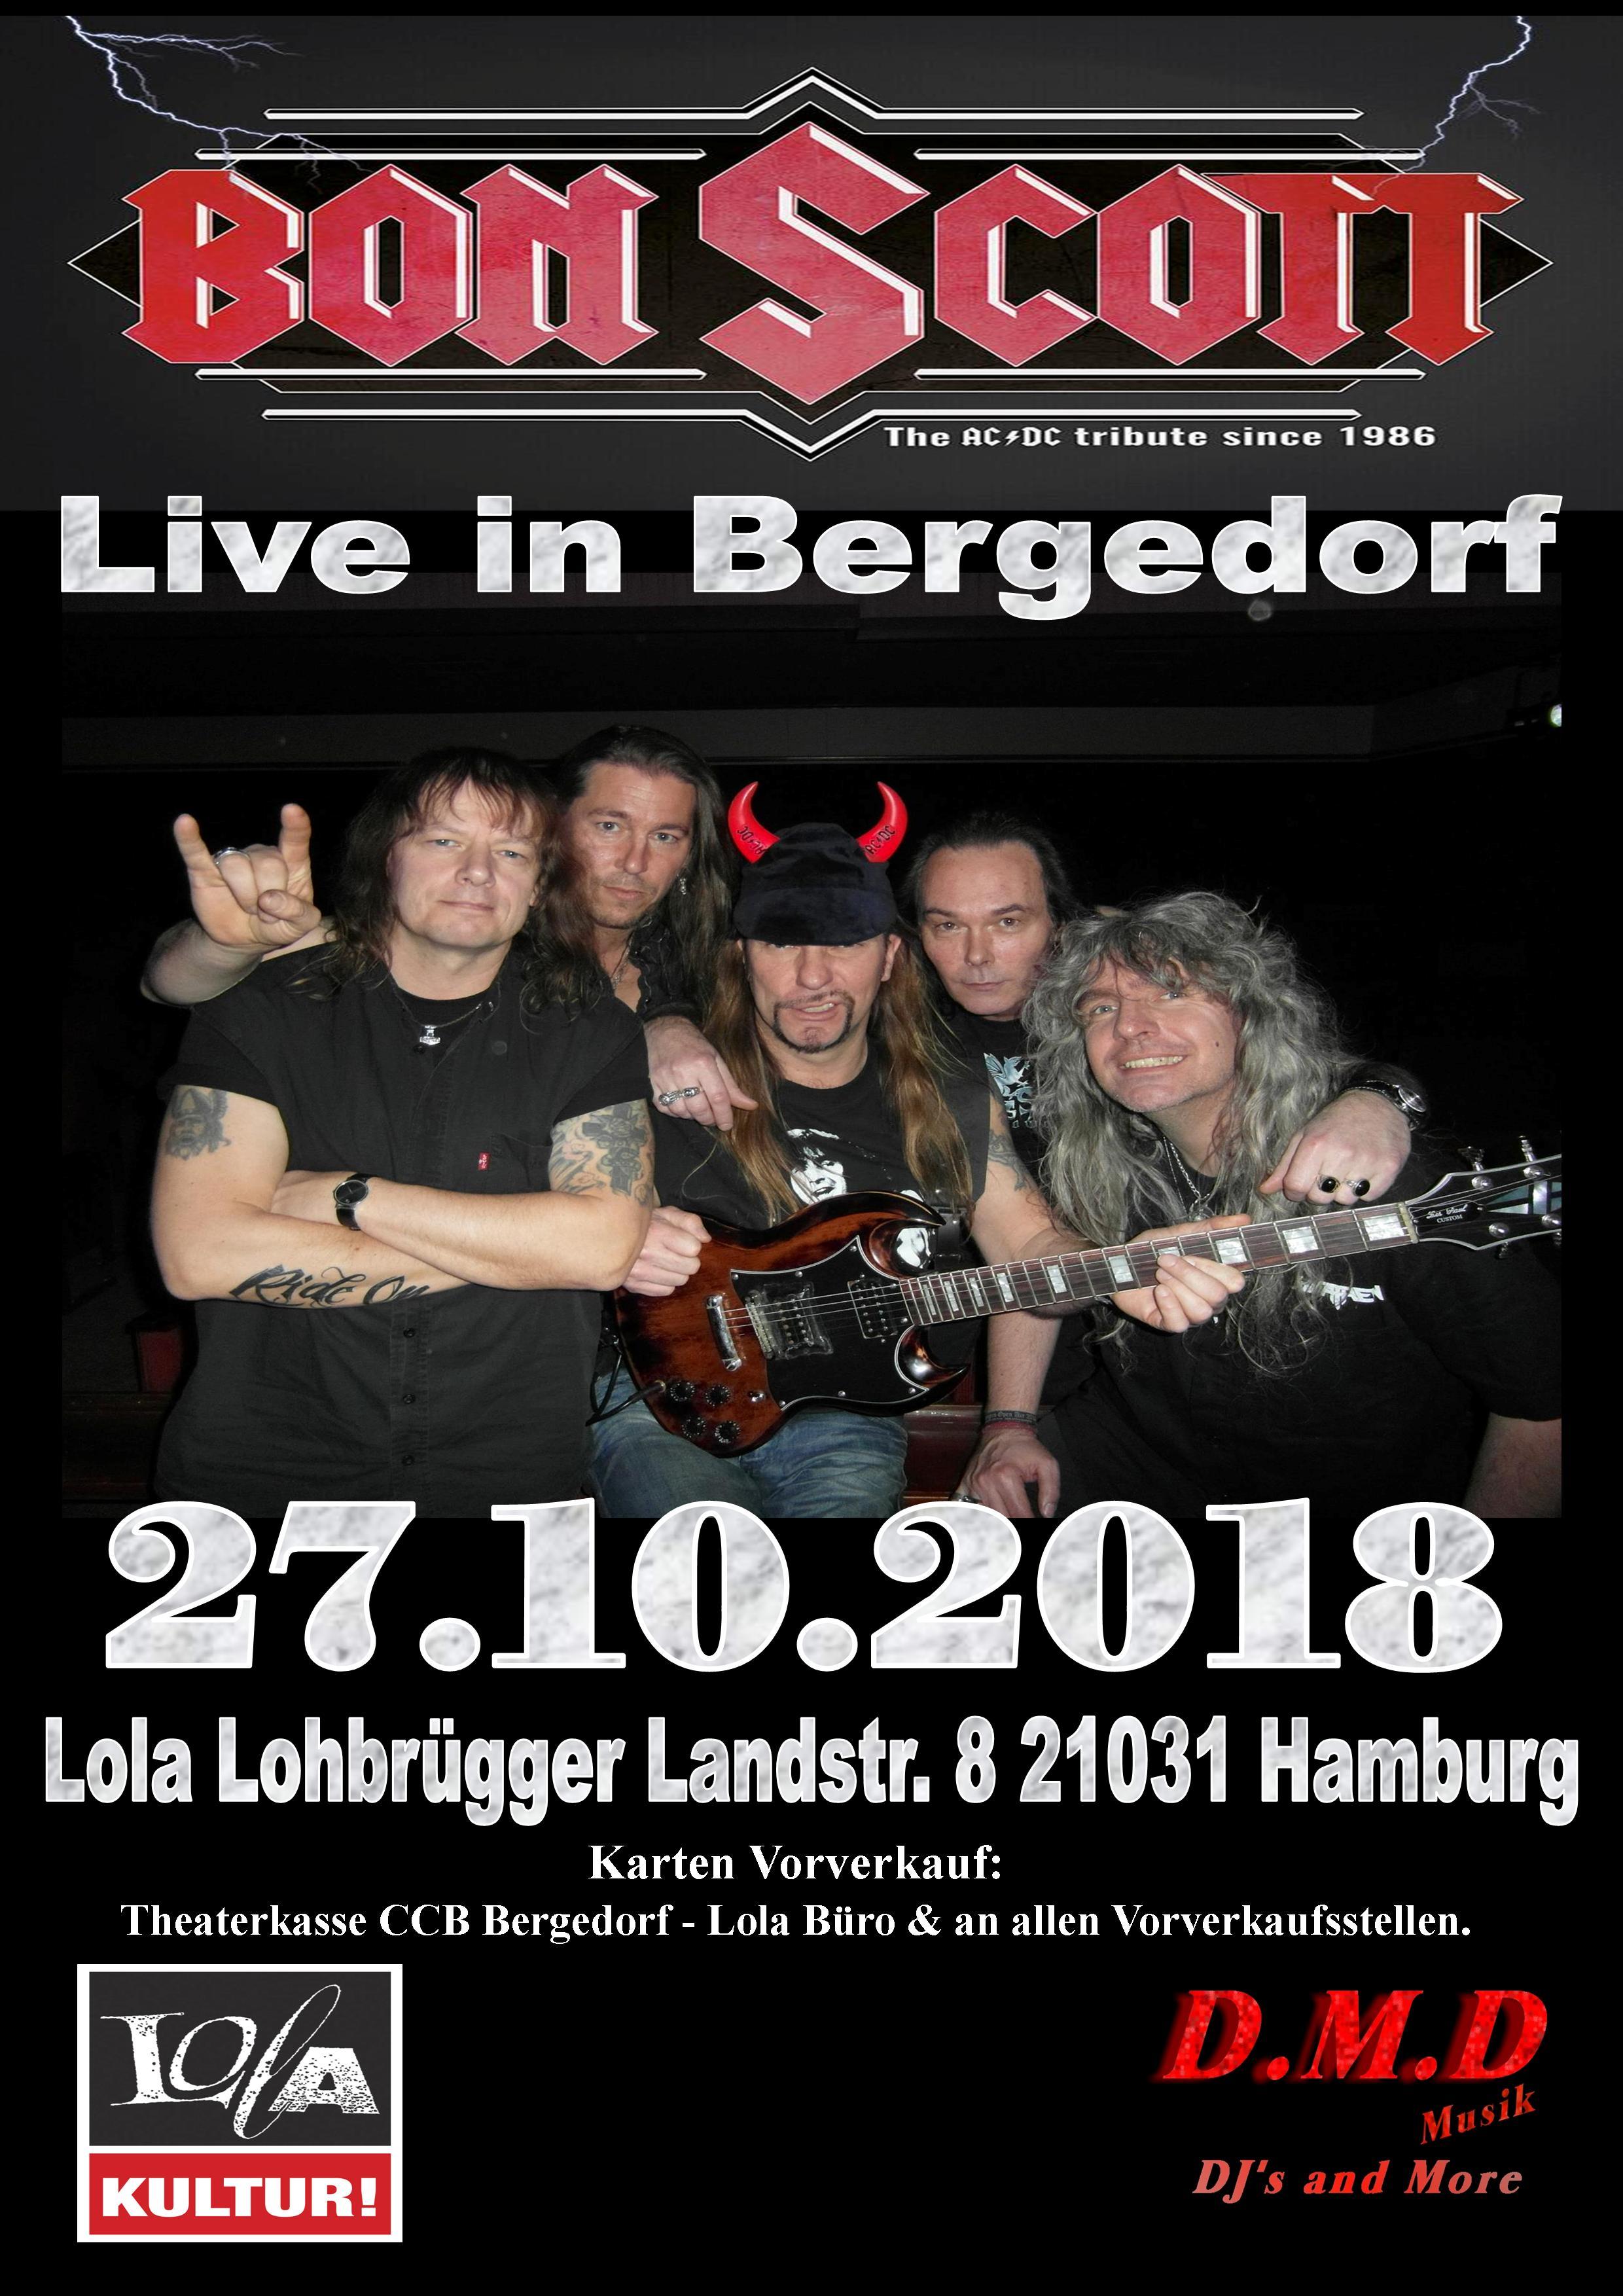 Bon Scott Live in Bergedorf